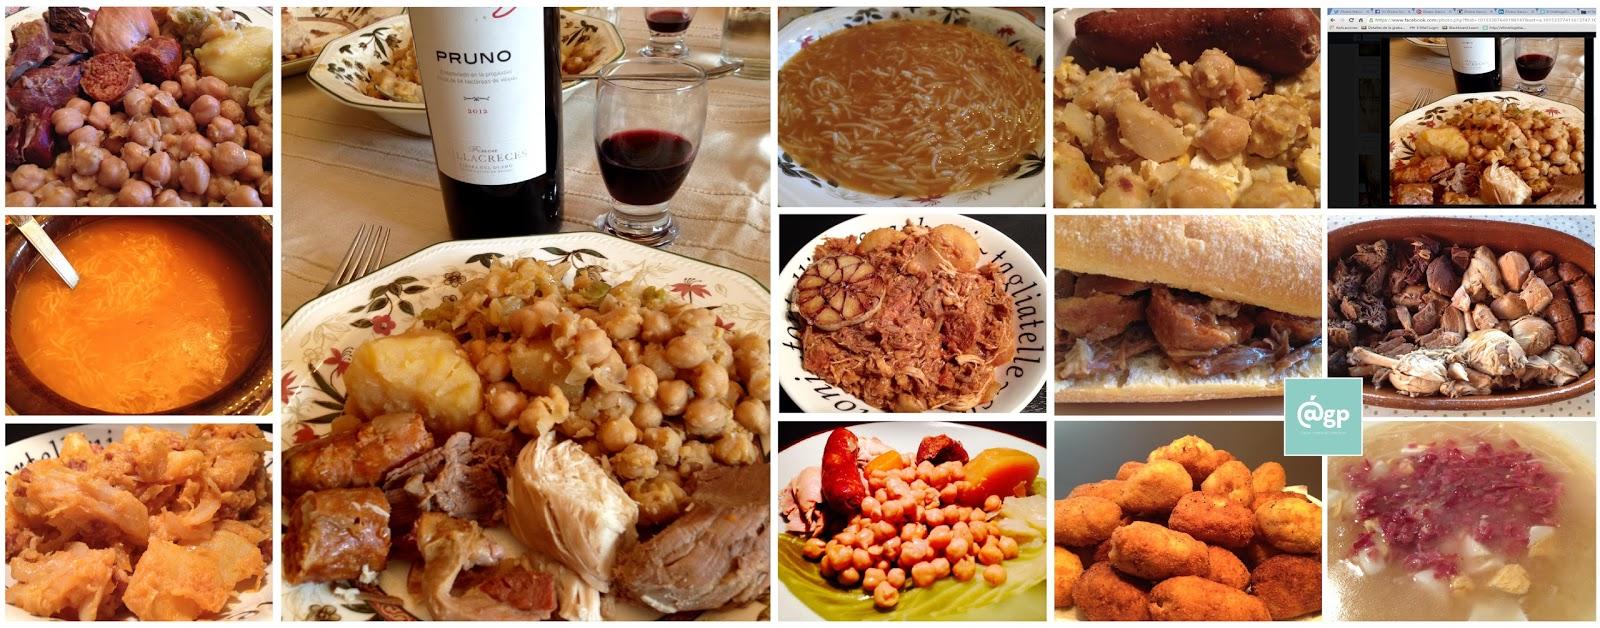 El troblogdita: La familia del Cocido madrileño